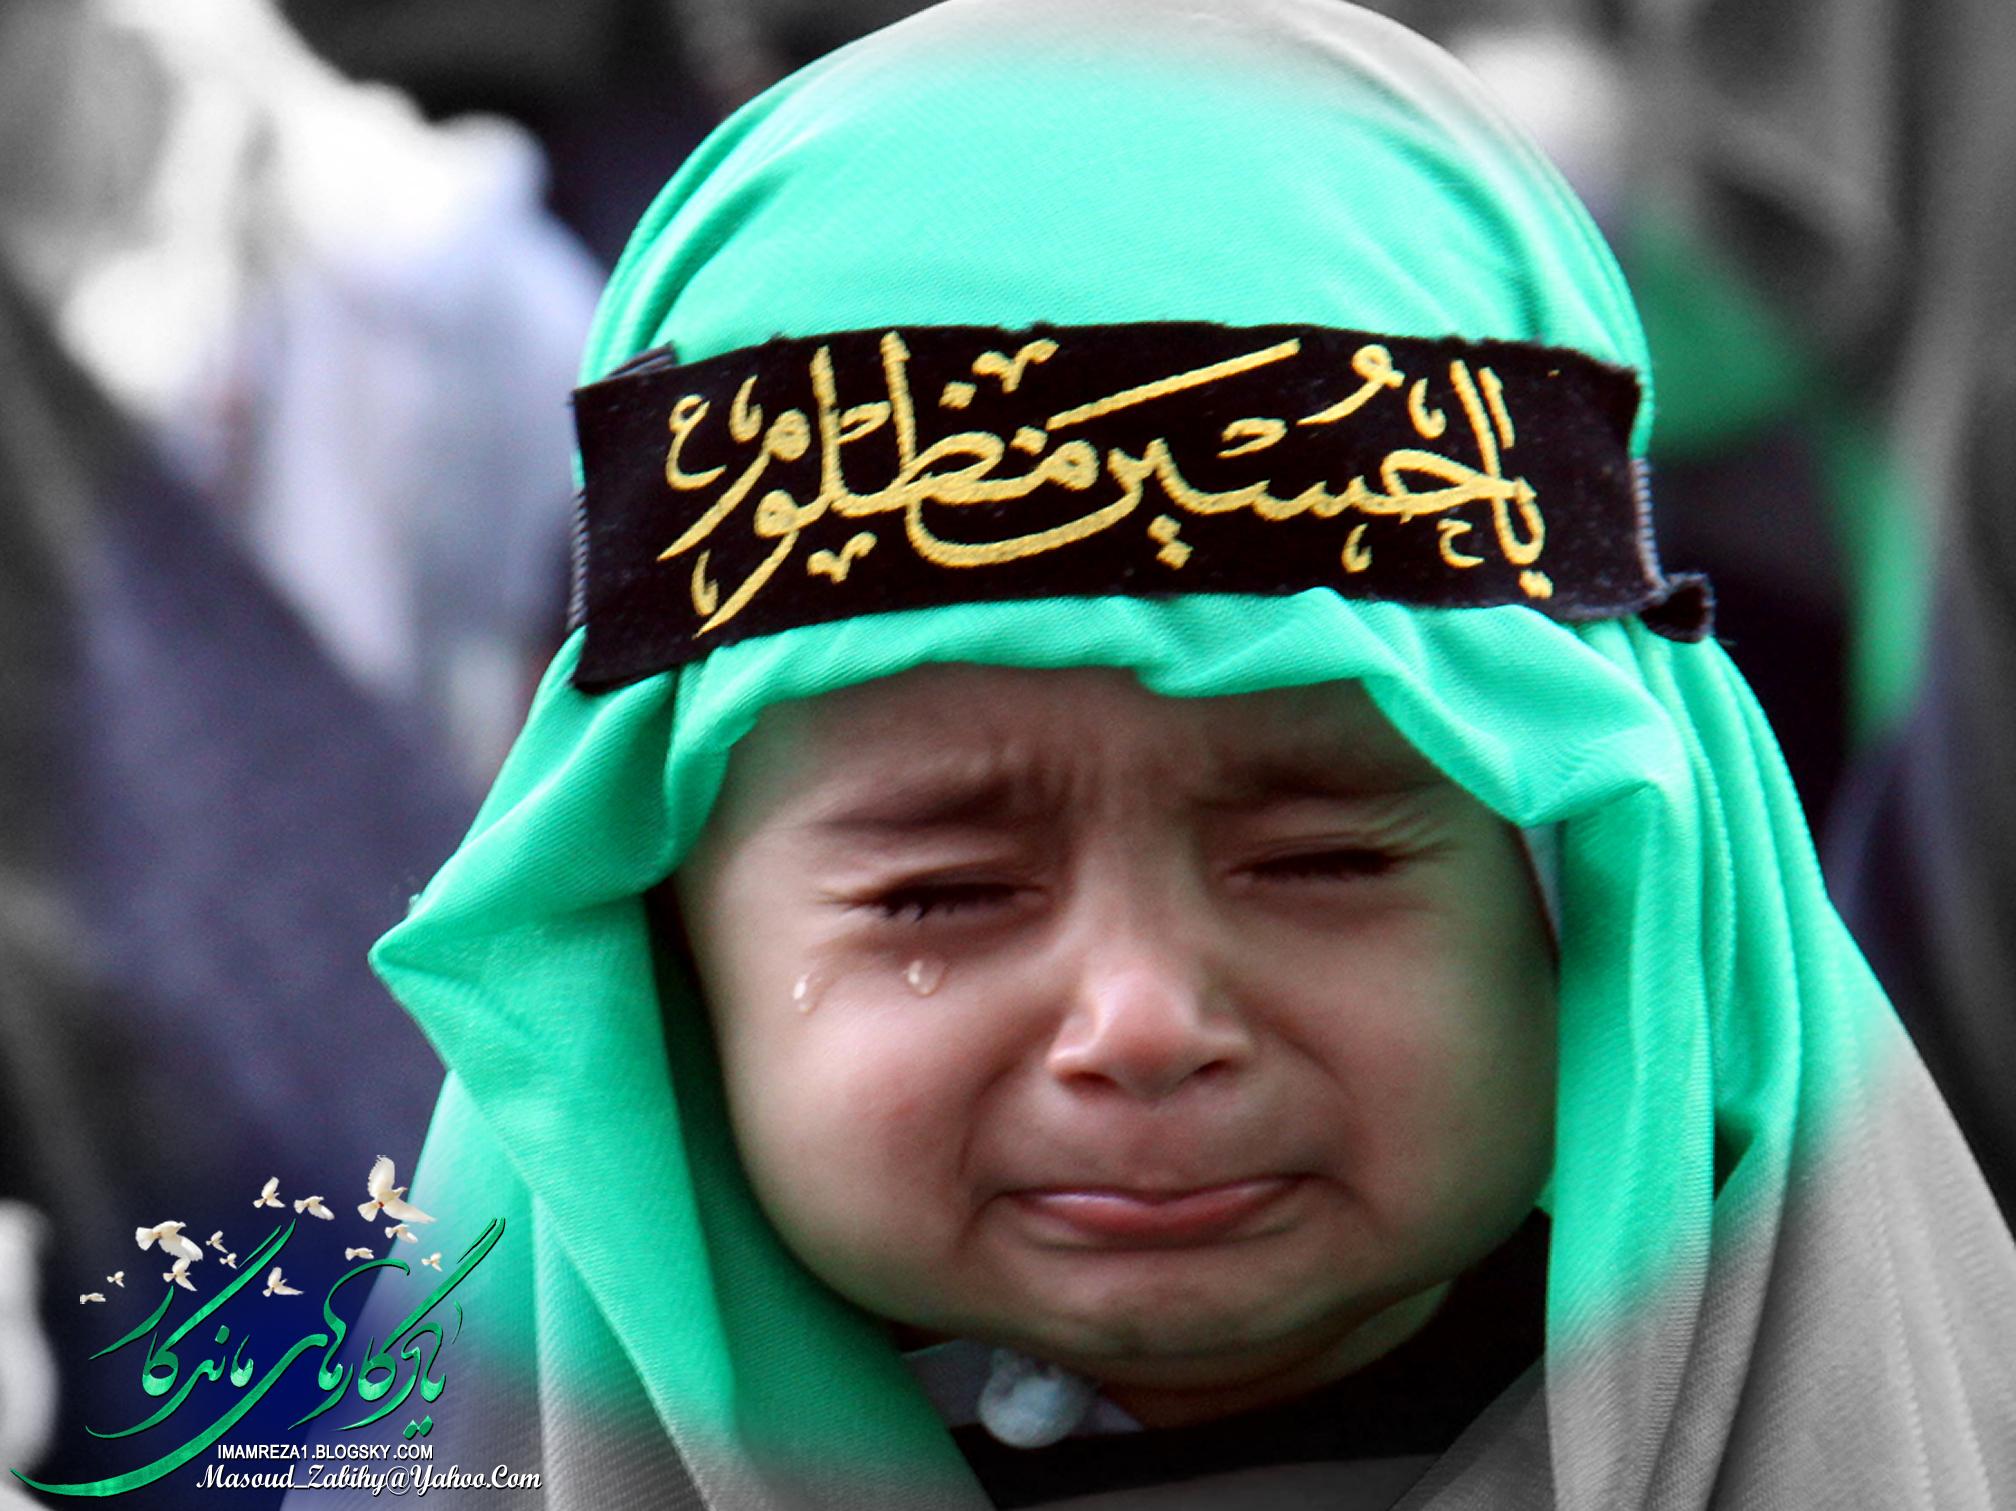 ... YA HAZRAT <b>ALI ASGHAR</b> by IMAMREZA1 - ya_hazrat_ali_asghar_by_imamreza1-d9gg0us